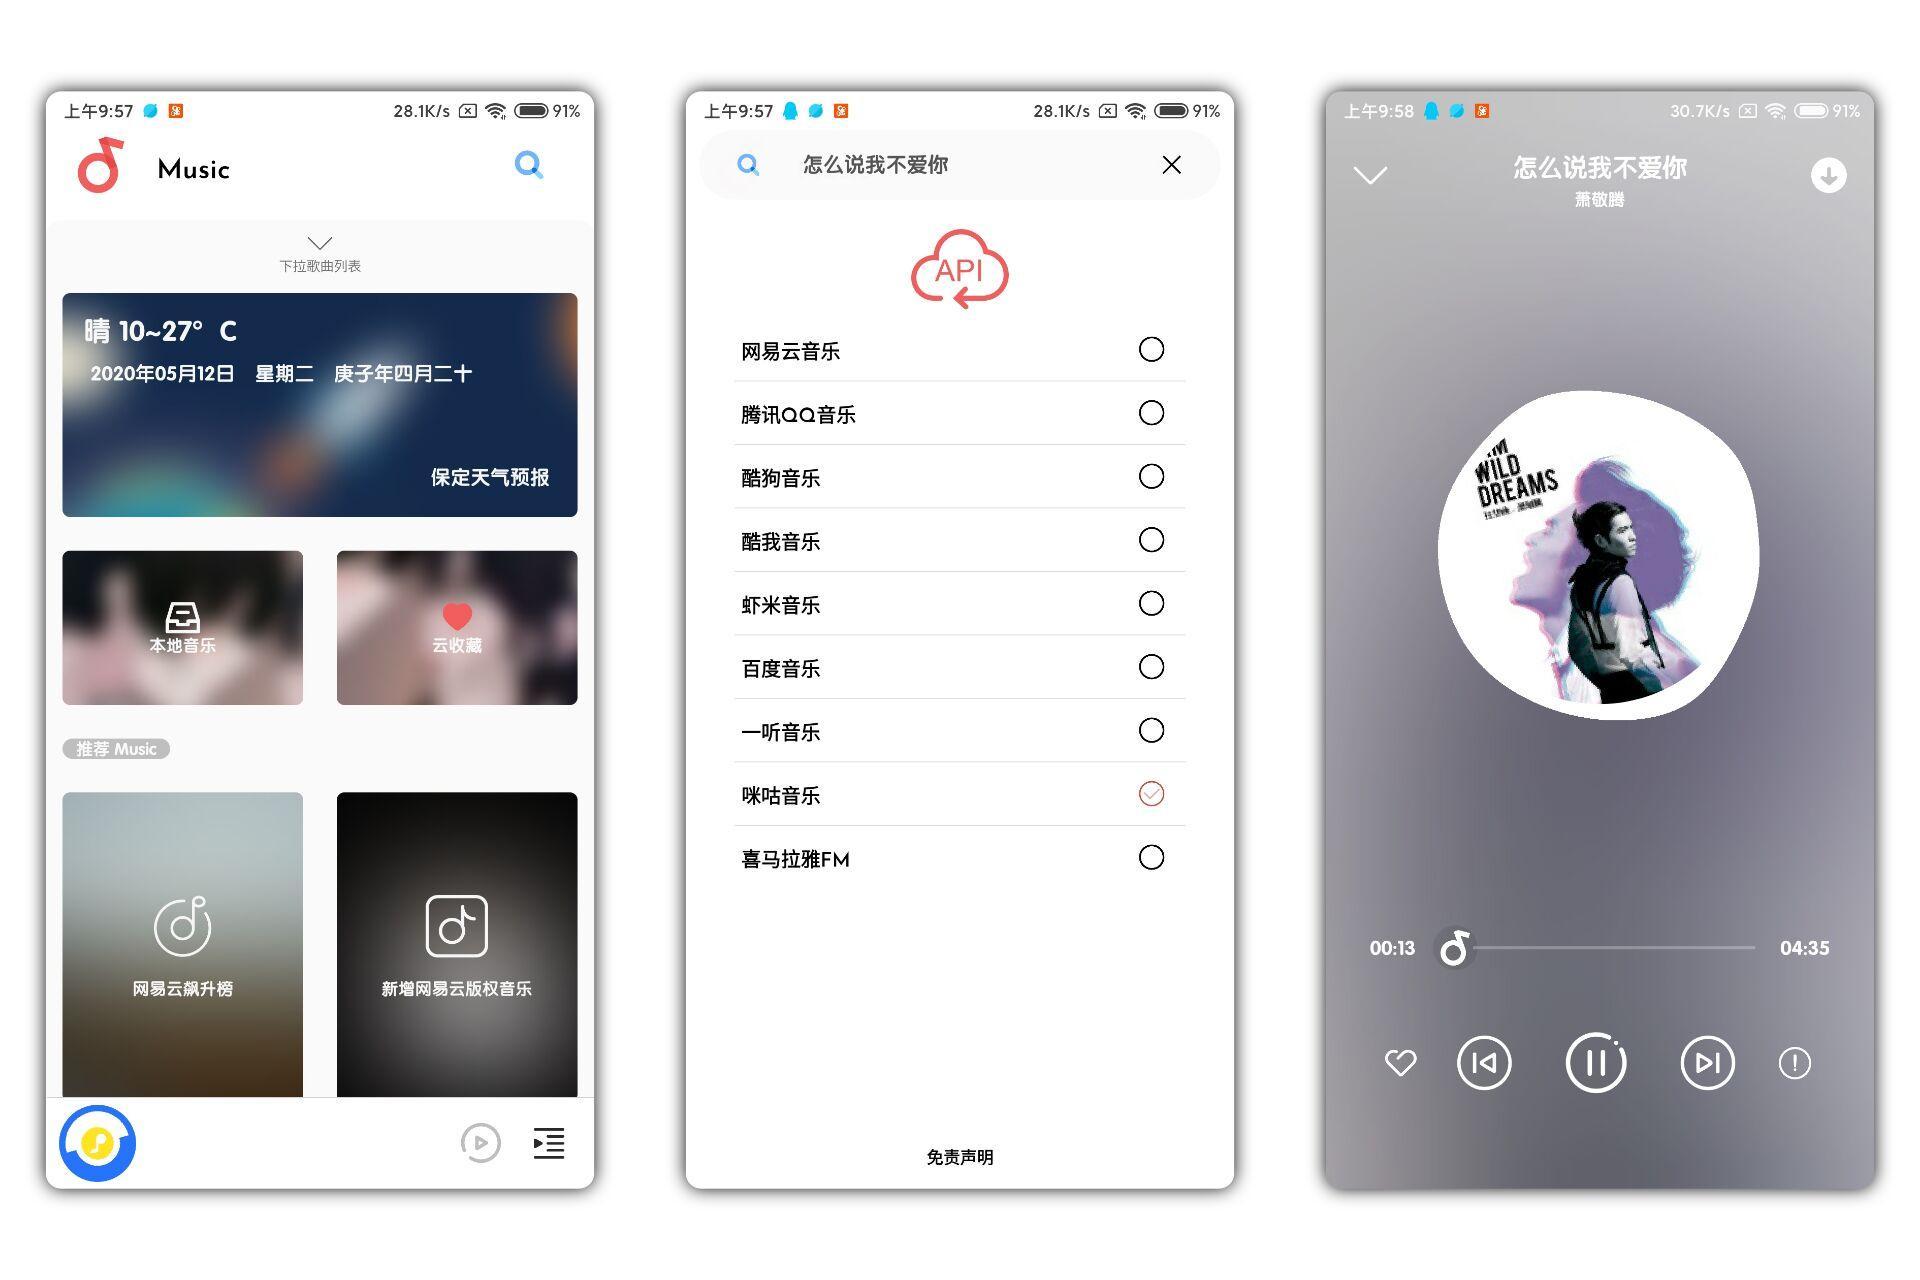 【Music】拥有9大音乐平台接口 可搜全网音乐免费下载,【Music】拥有9大音乐平台接口 可搜全网音乐免费下载,第2张